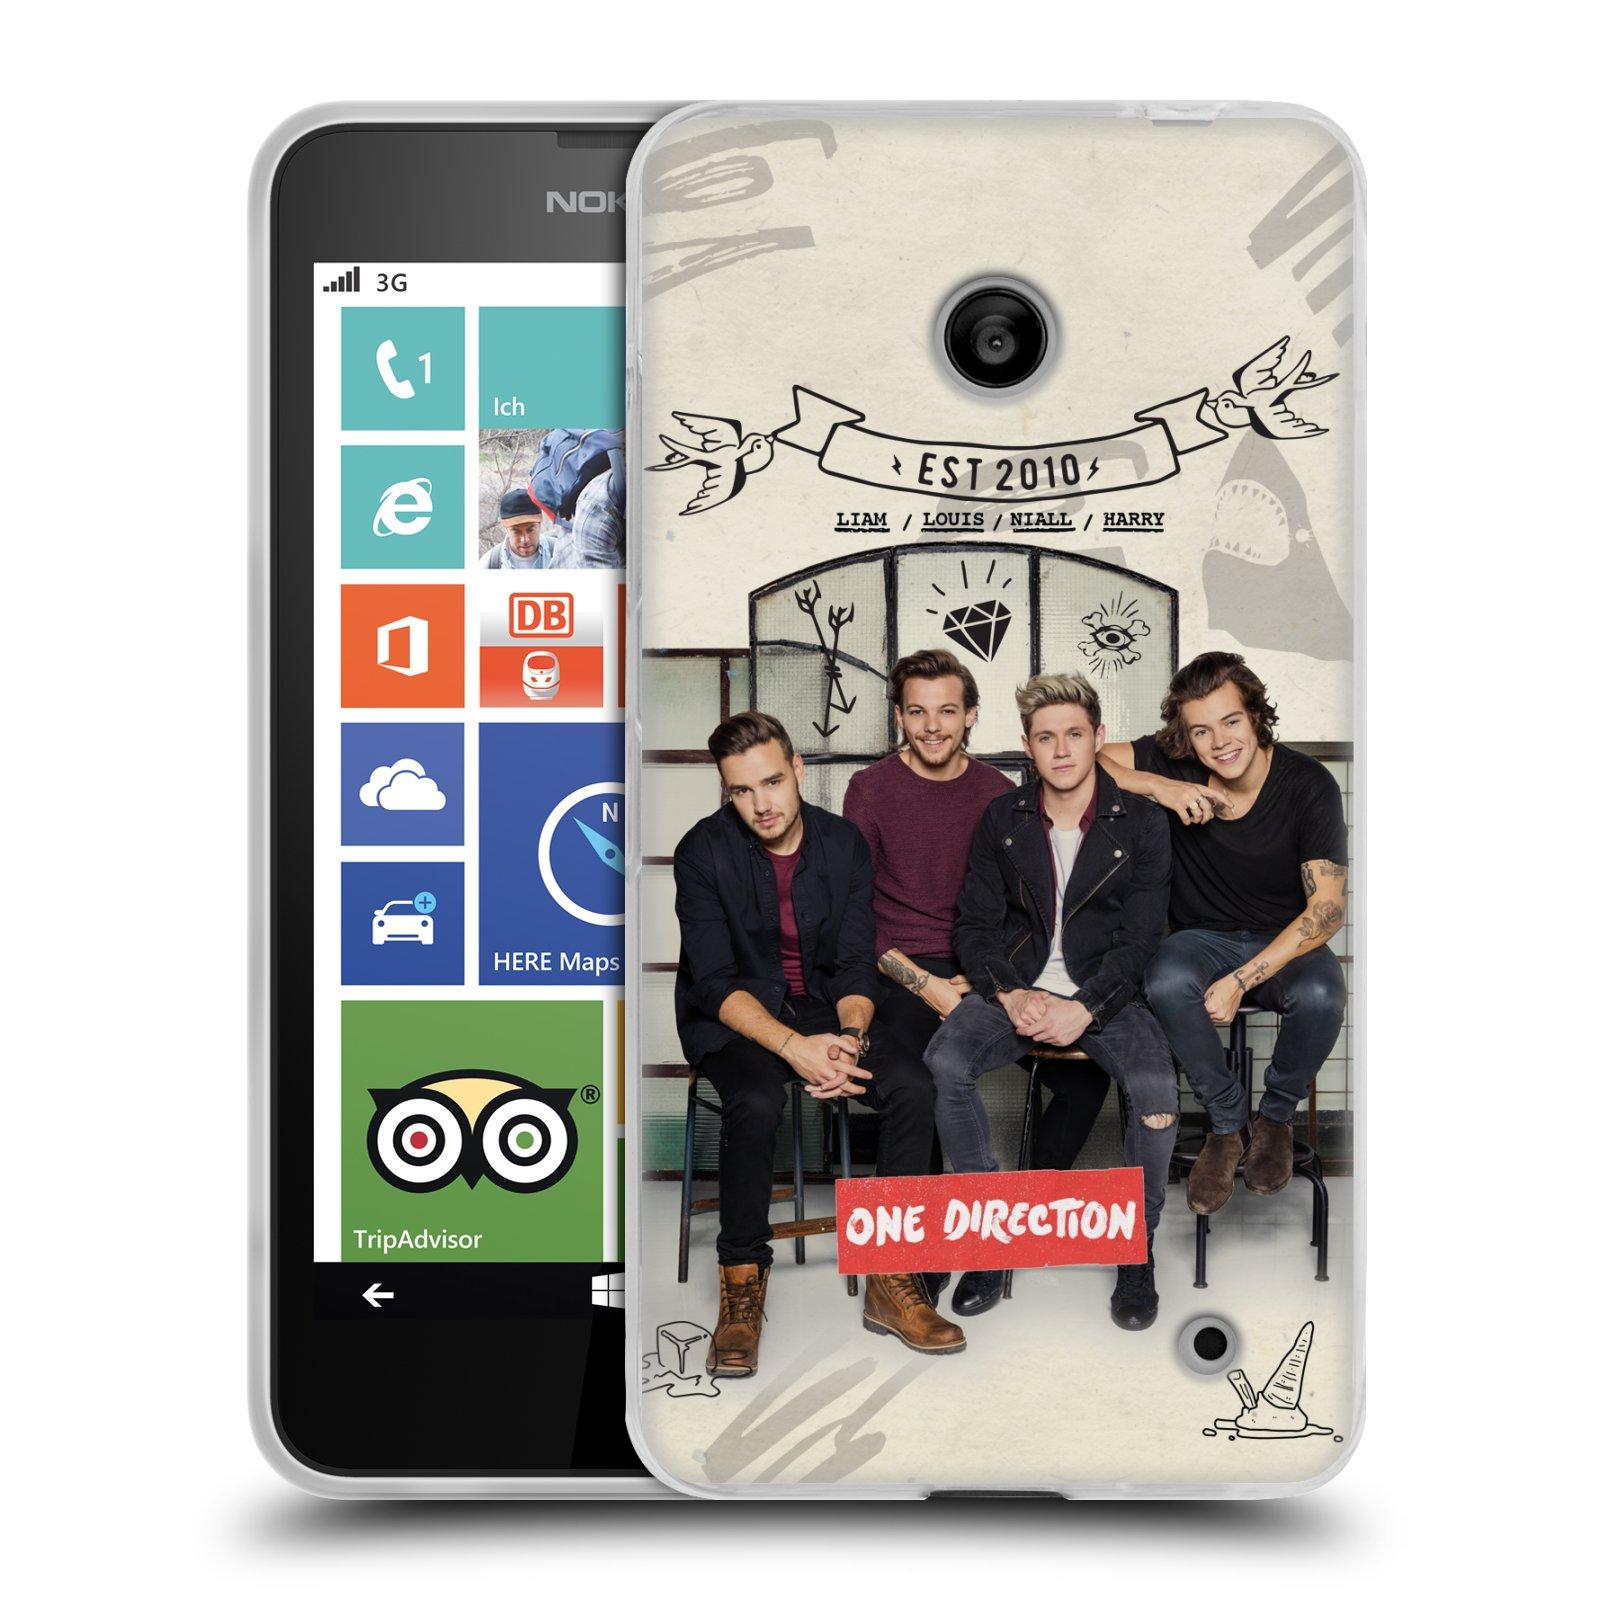 Silikonové pouzdro na mobil Nokia Lumia 635 HEAD CASE One Direction - EST 2010 (Silikonový kryt či obal One Direction Official na mobilní telefon Nokia Lumia 635 Dual SIM)